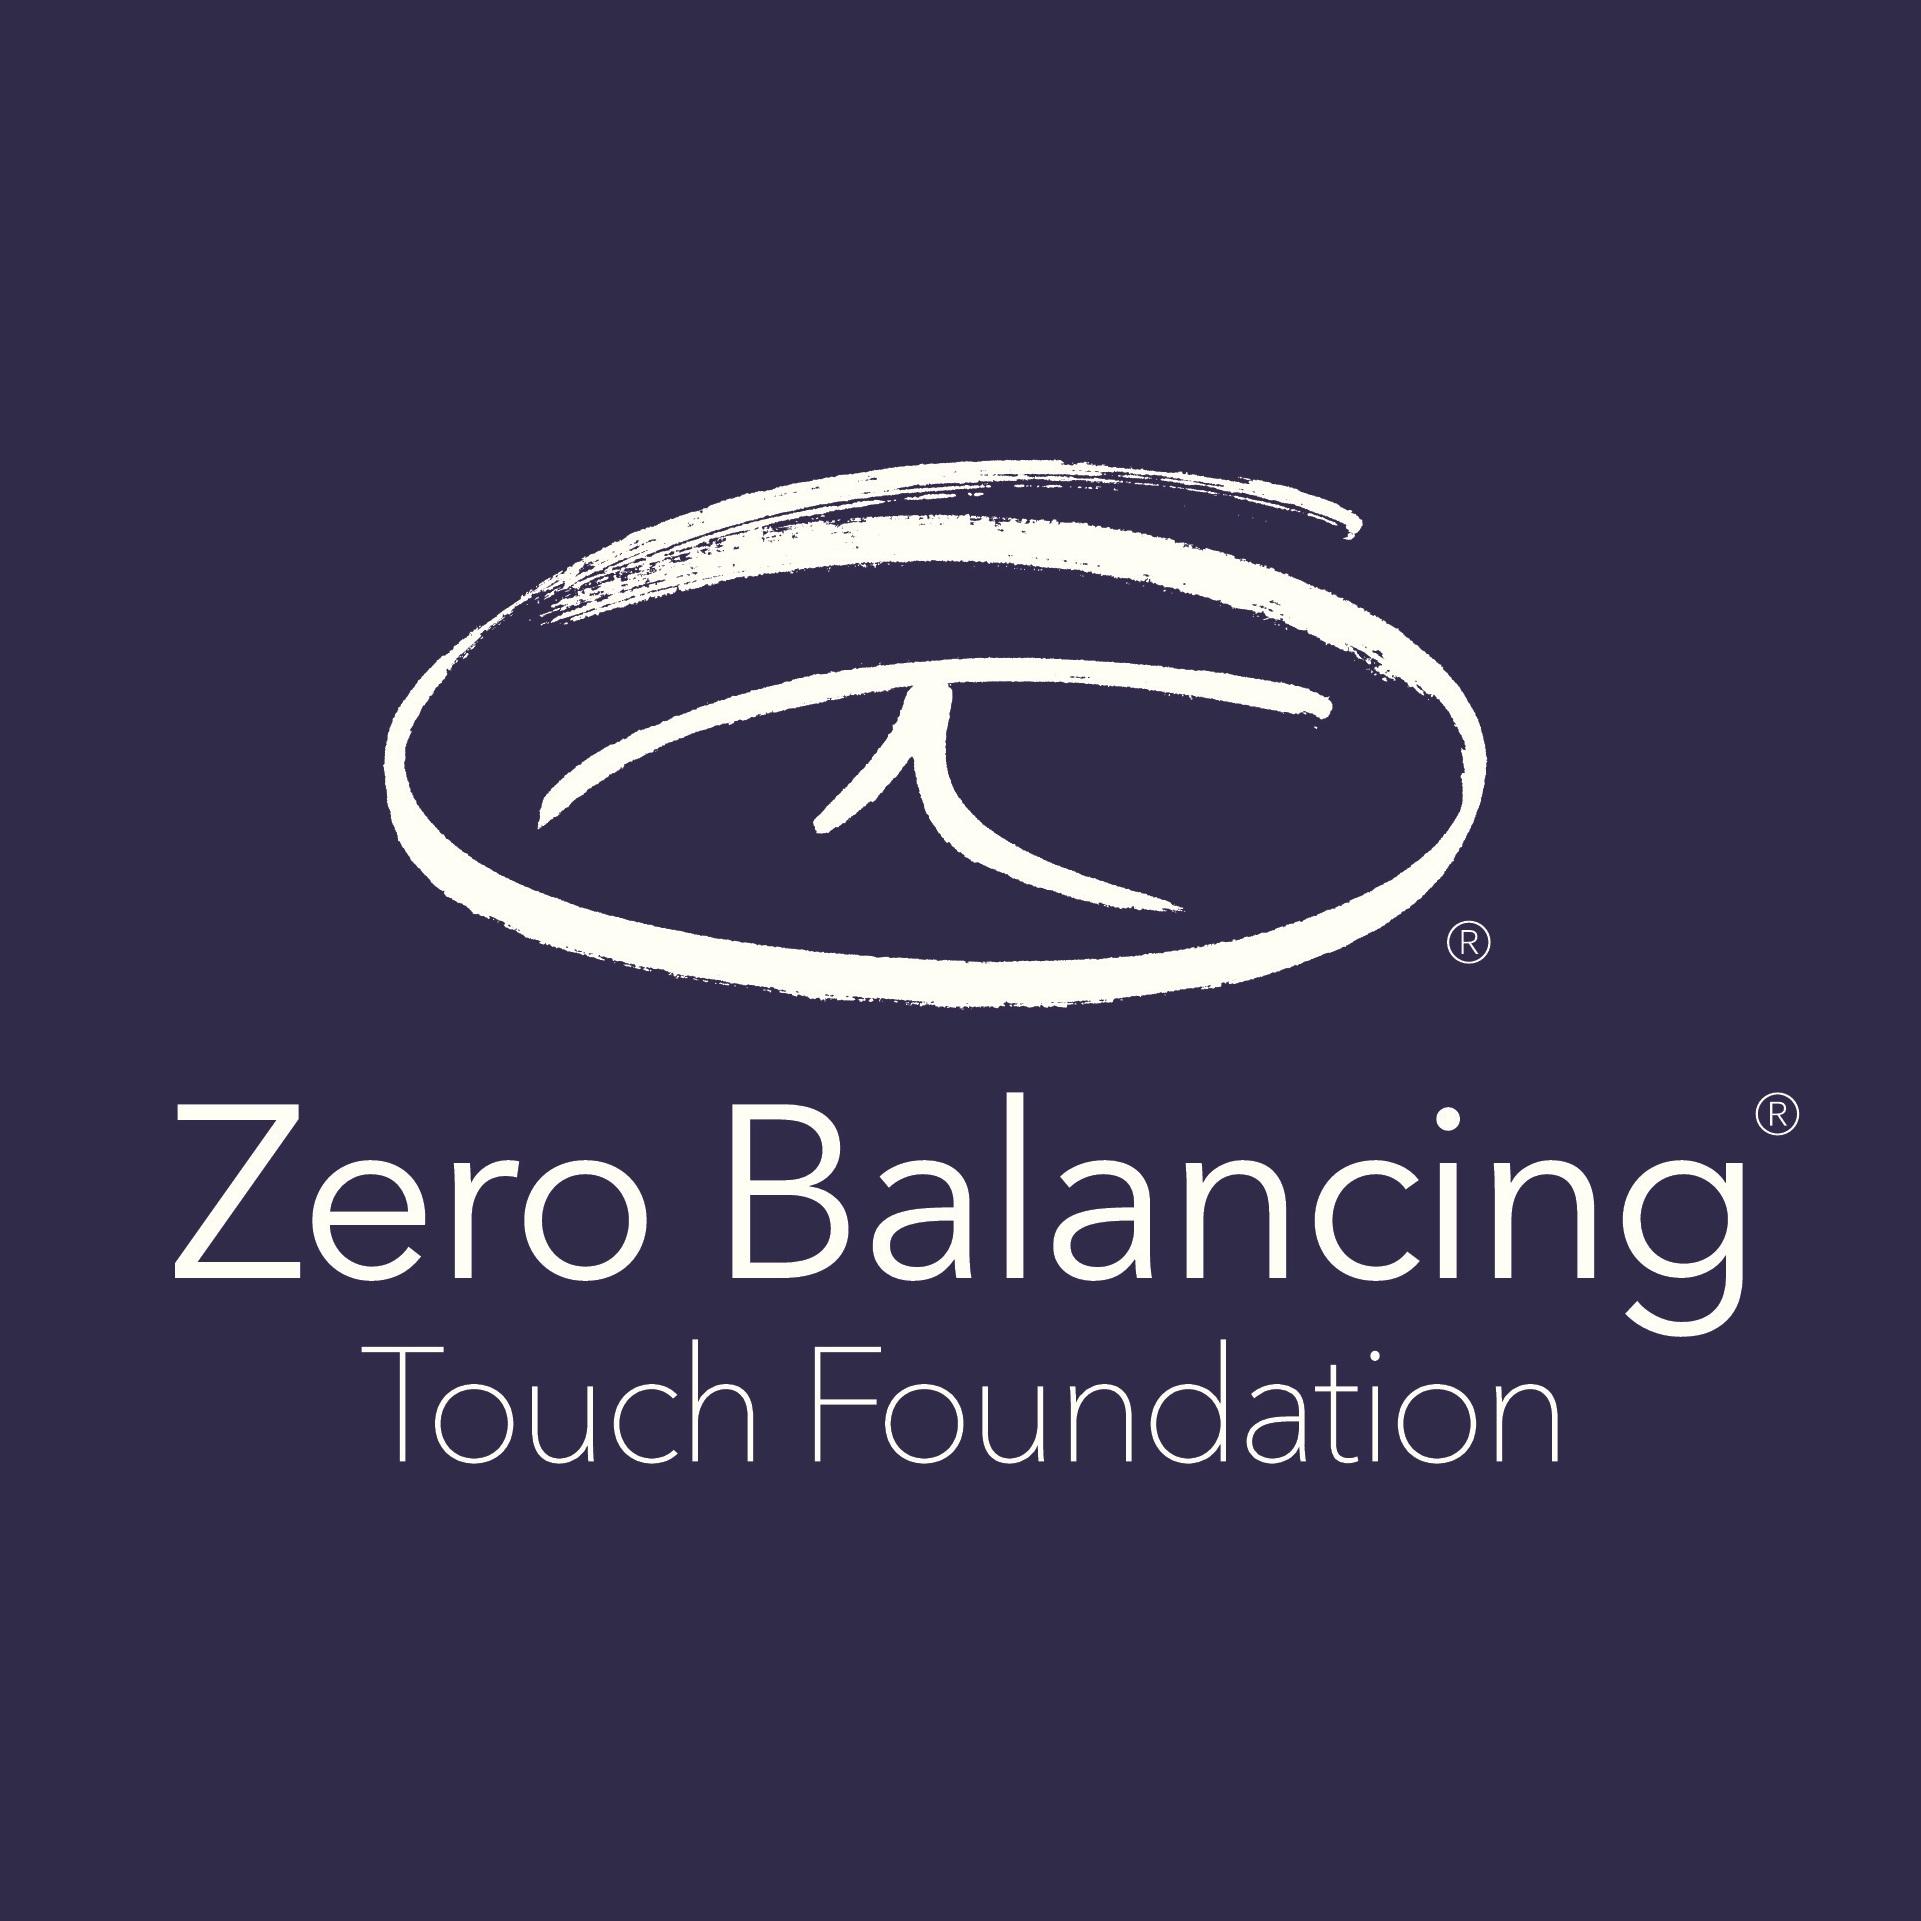 Zero Balancing Touch foundation Logo